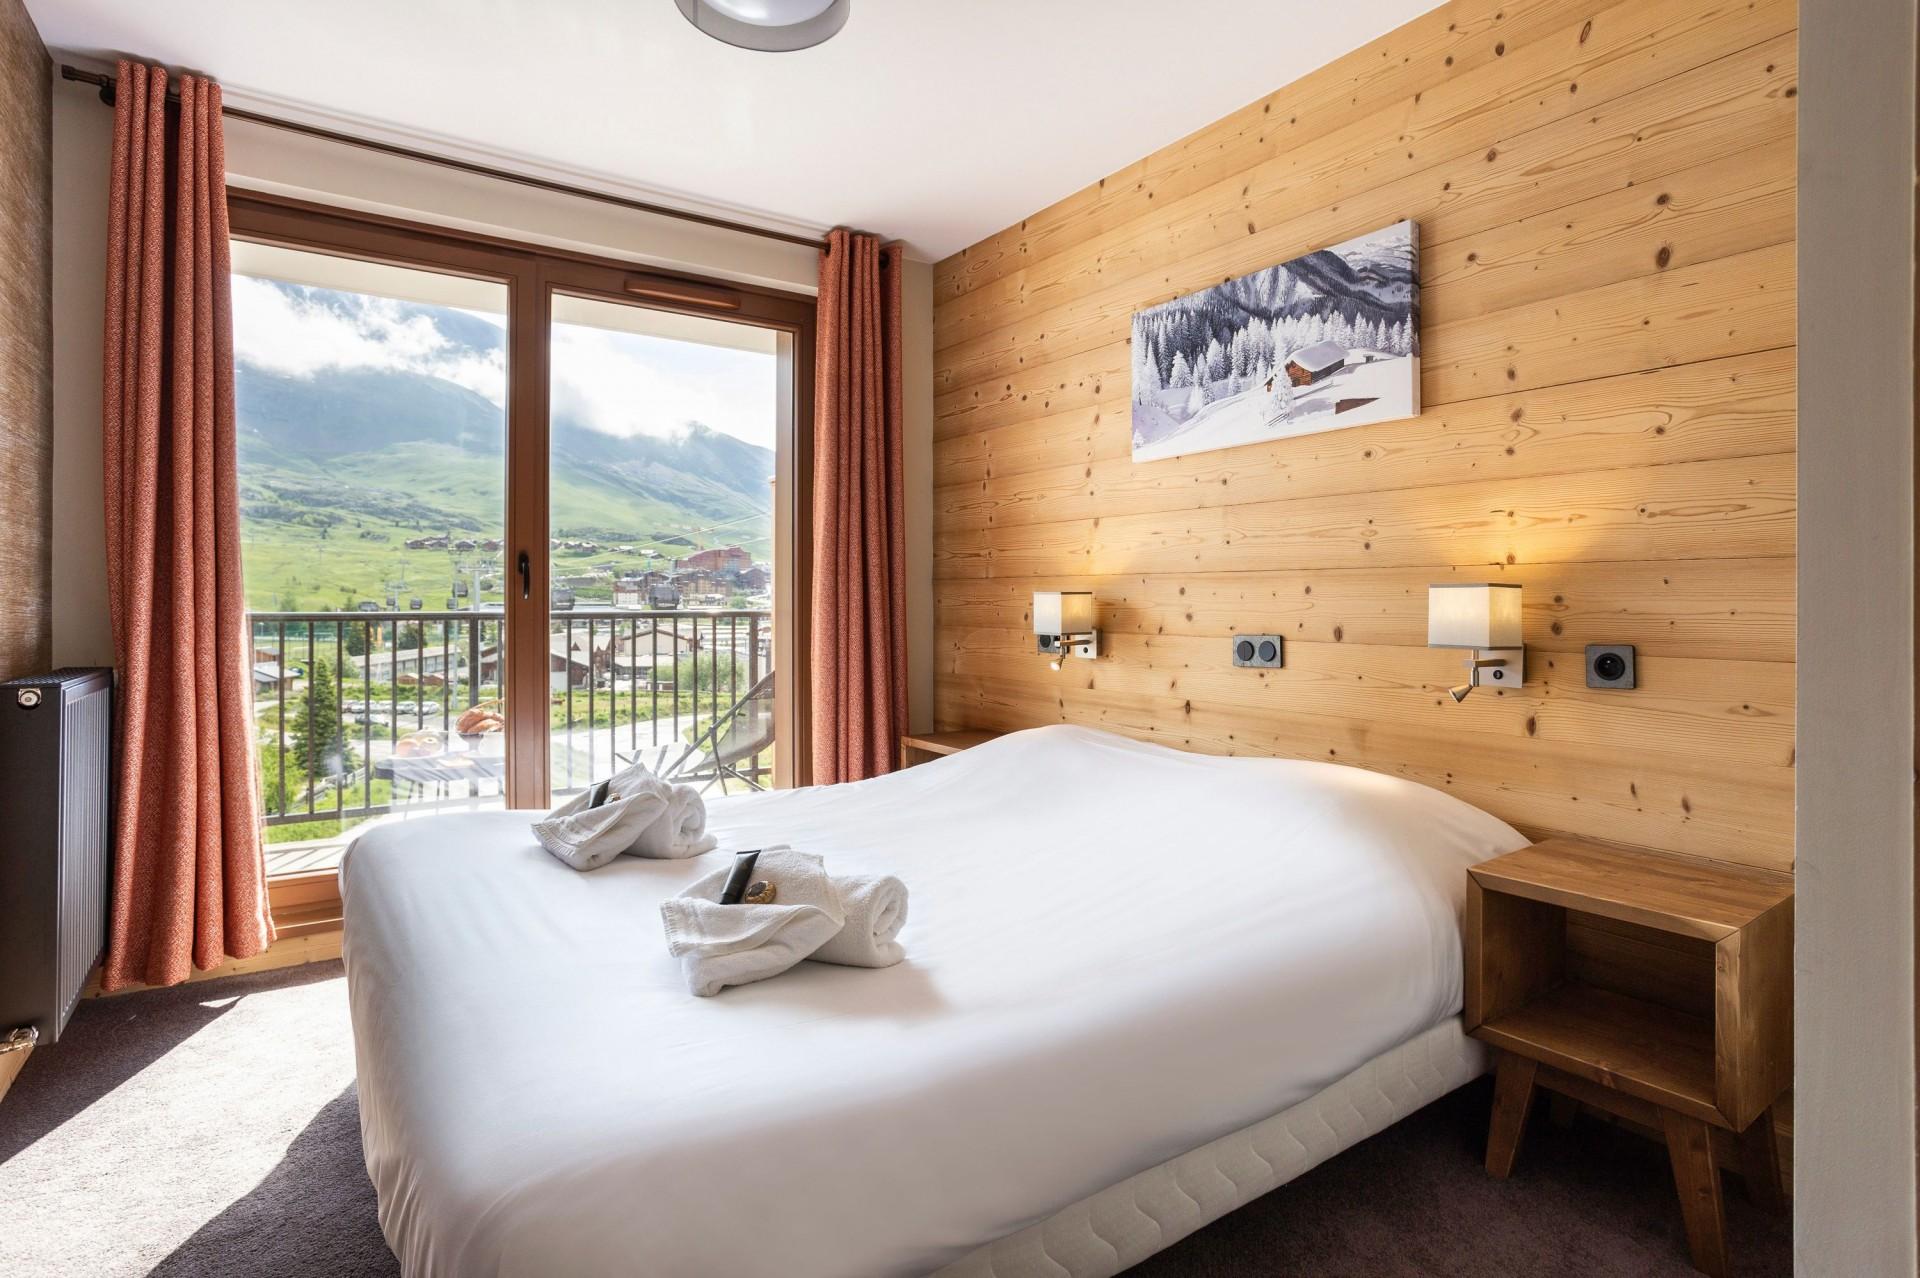 alpe-d-huez-location-appartement-luxe-amare